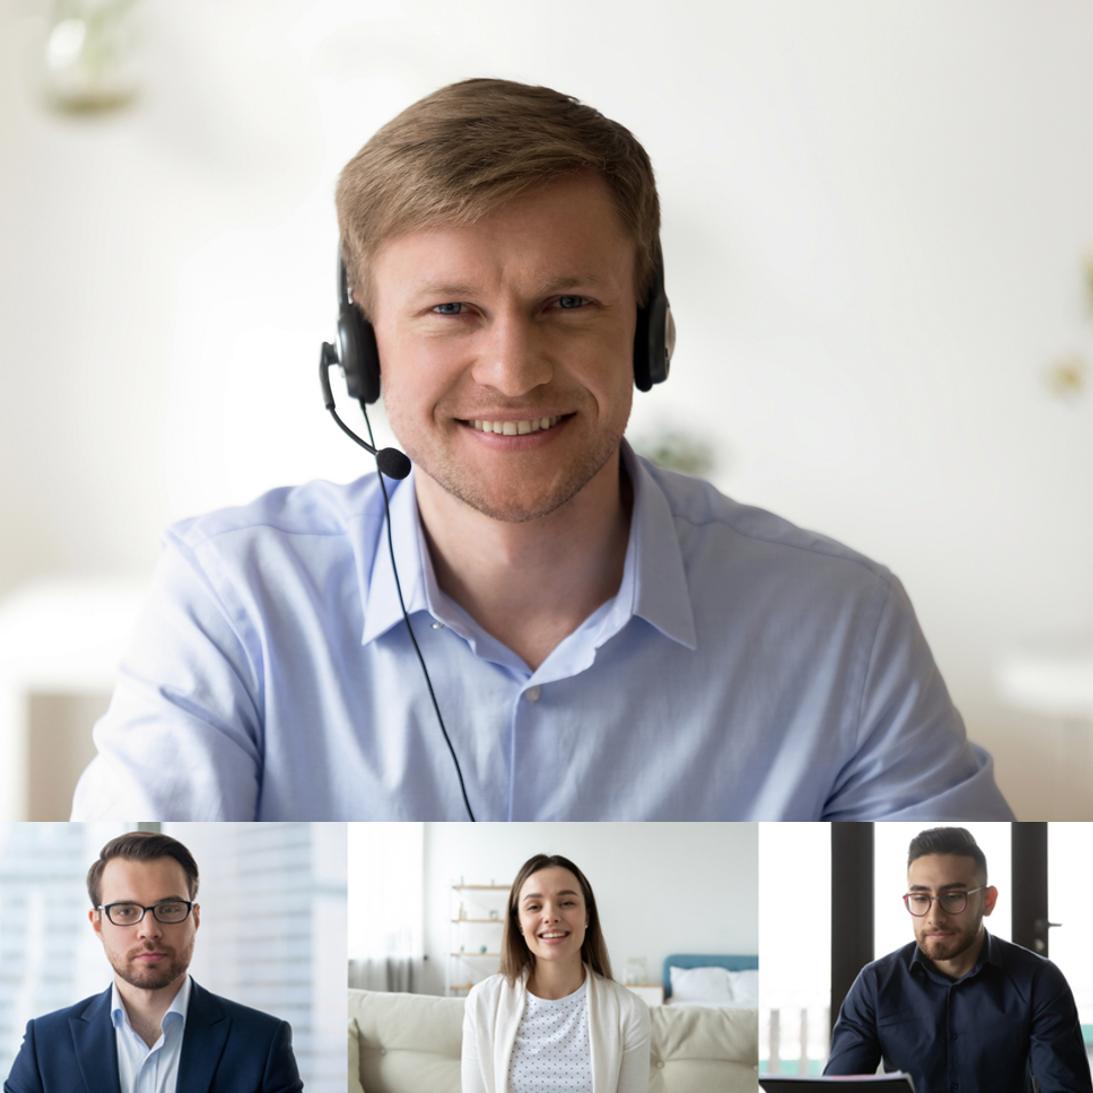 Virtual Meetings that Work for Everyone - Turpin Communication